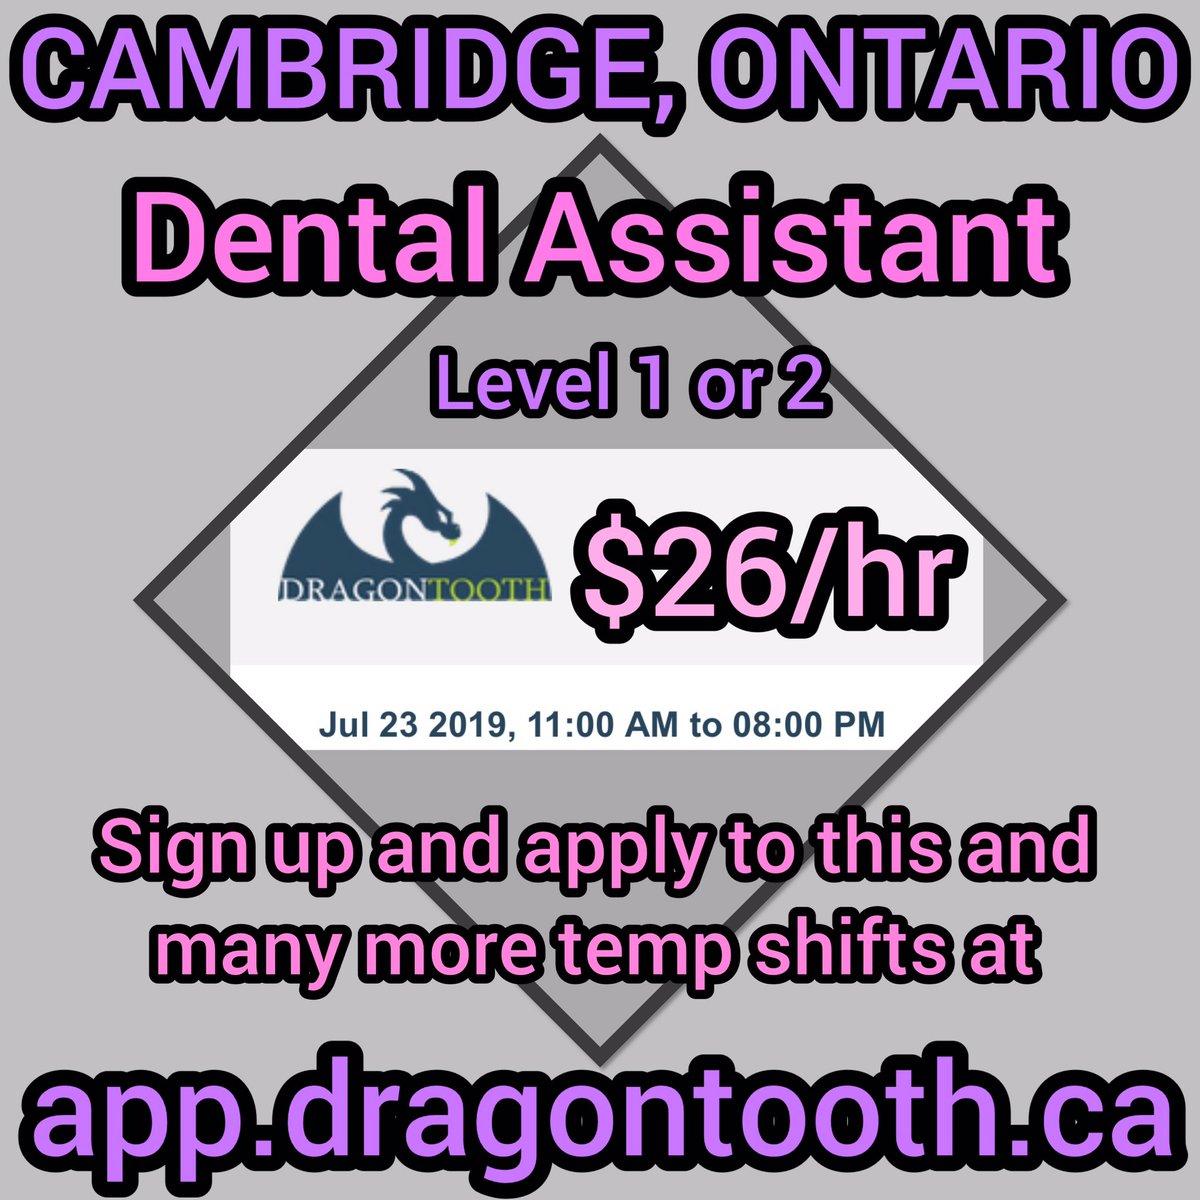 Dental Assisting temp shift available tomorrow in Cambridge,Ontario. Sign up and apply!!! #dentalassisting #dentalassistant #cda #canadiandental #canadiandentalassociation #canadiandentalassistants #ontariodentalassistantsassociation #ontariodentalassociation #oda #cda #dental